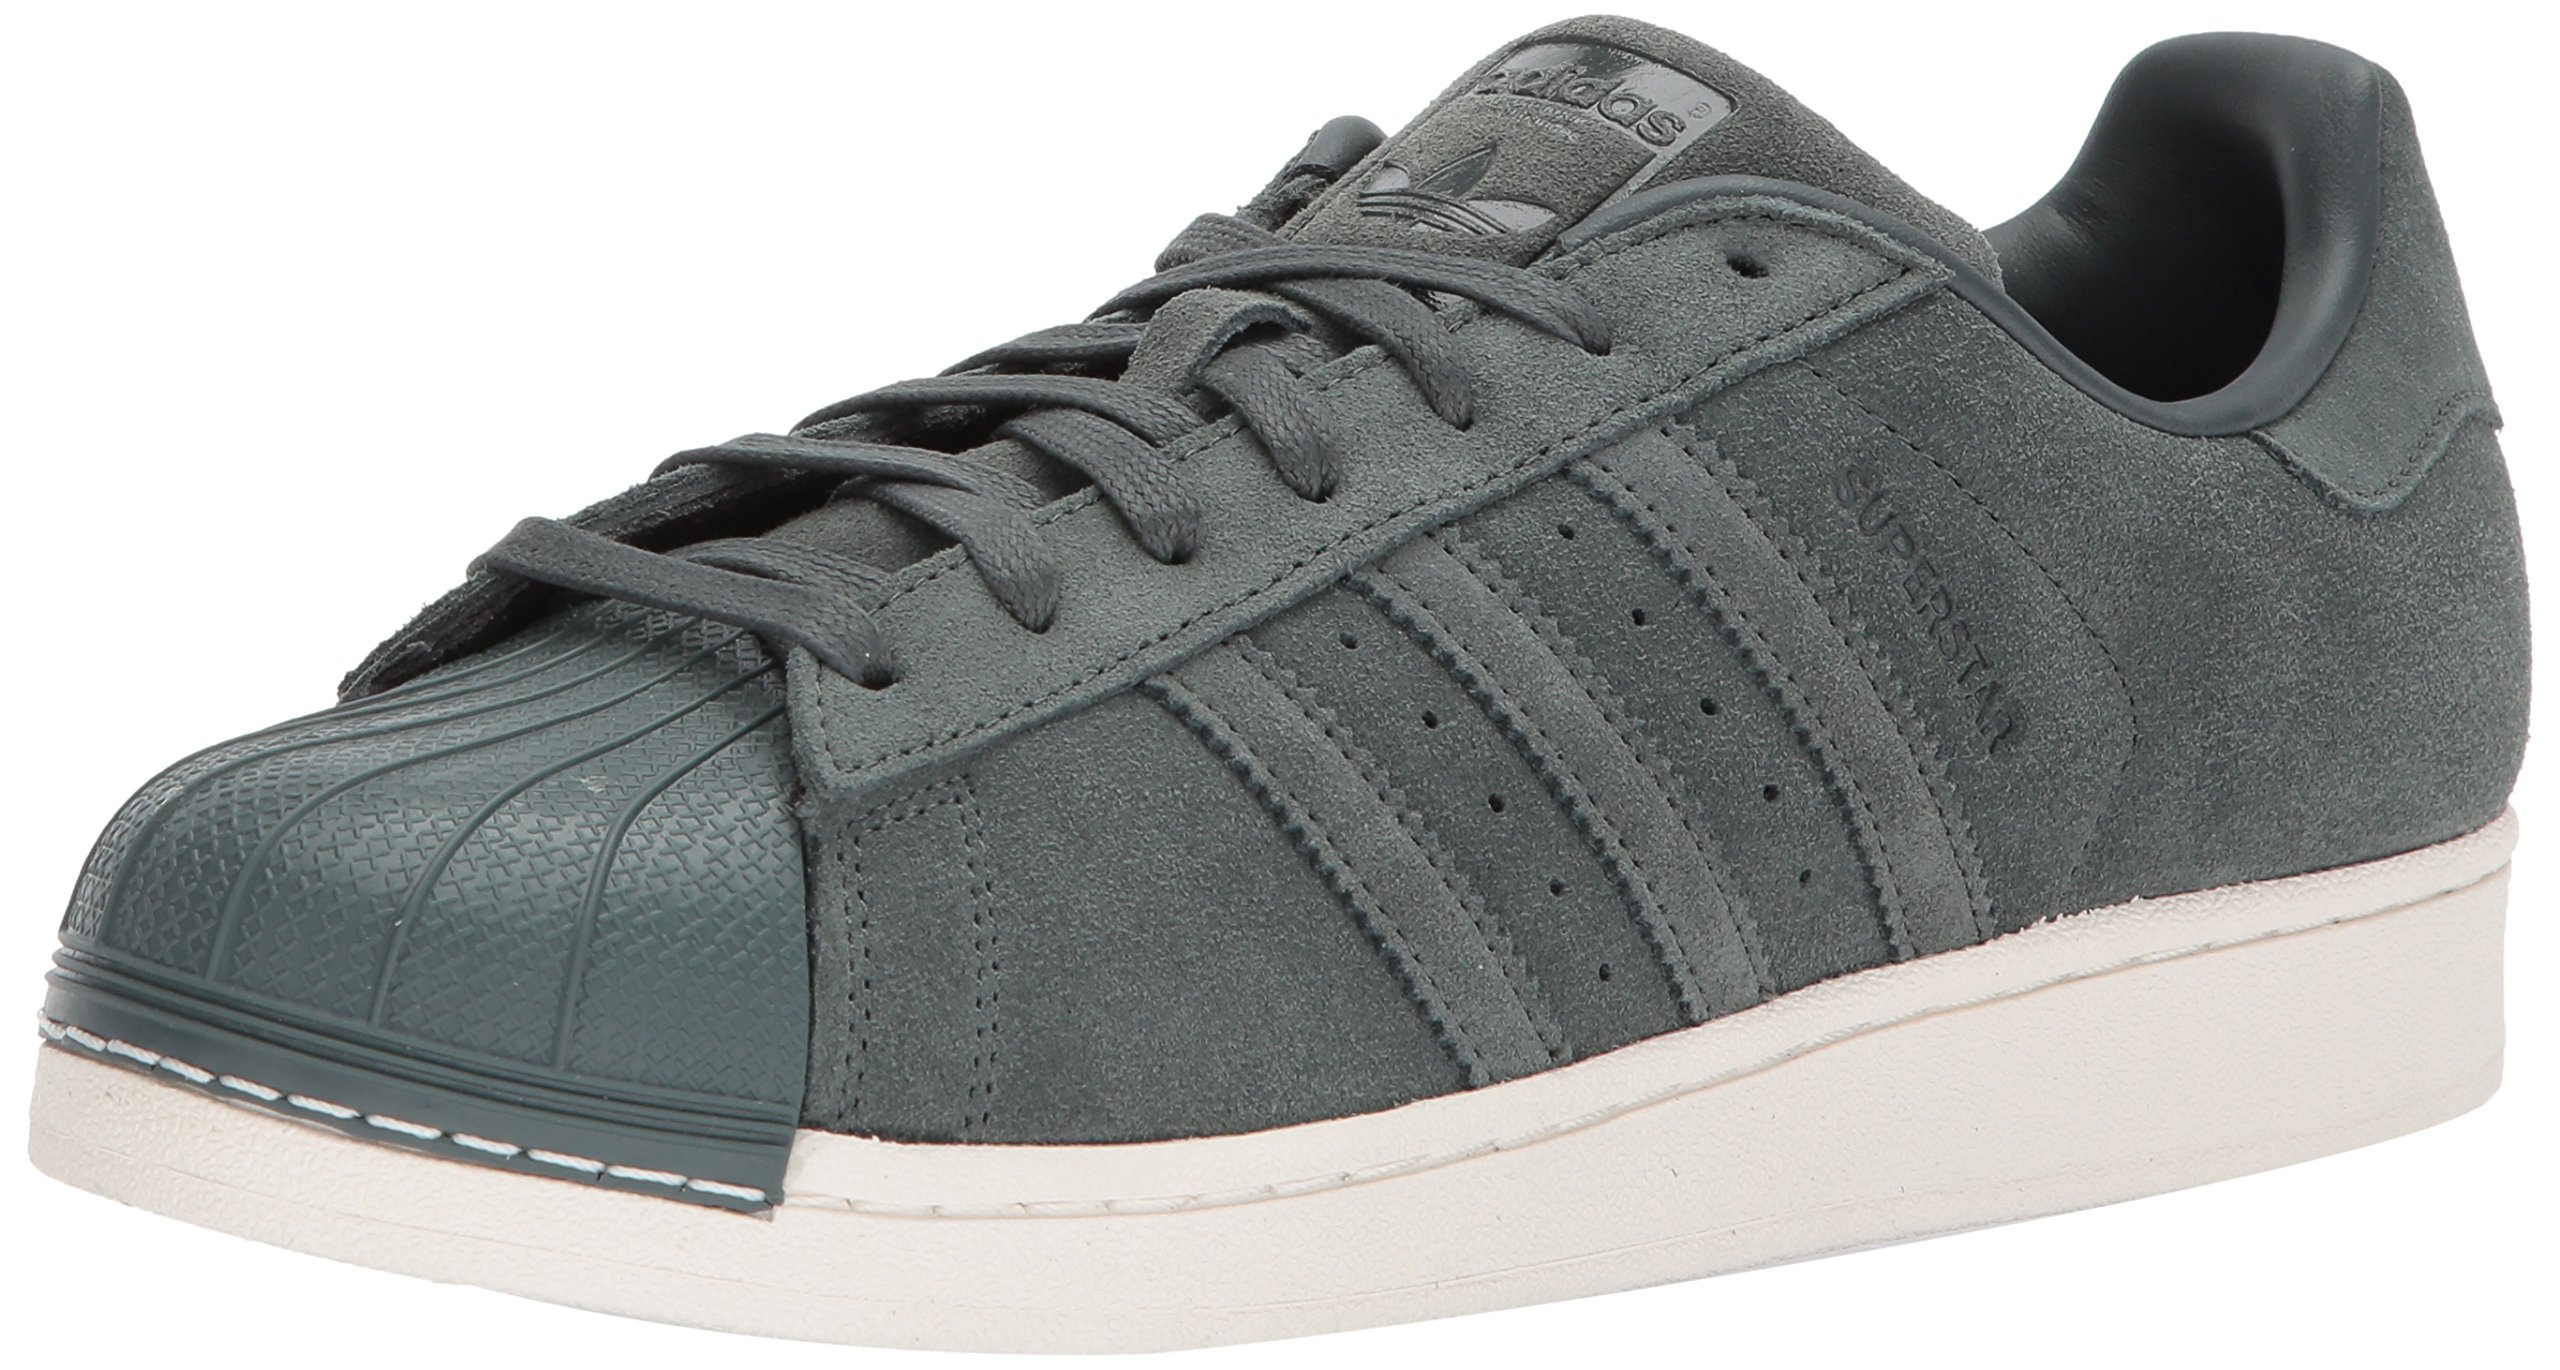 adidas Originals Men's Superstar Foundation Casual Sneaker, Green Night/Green Night/Green Night, 10 D(M) US